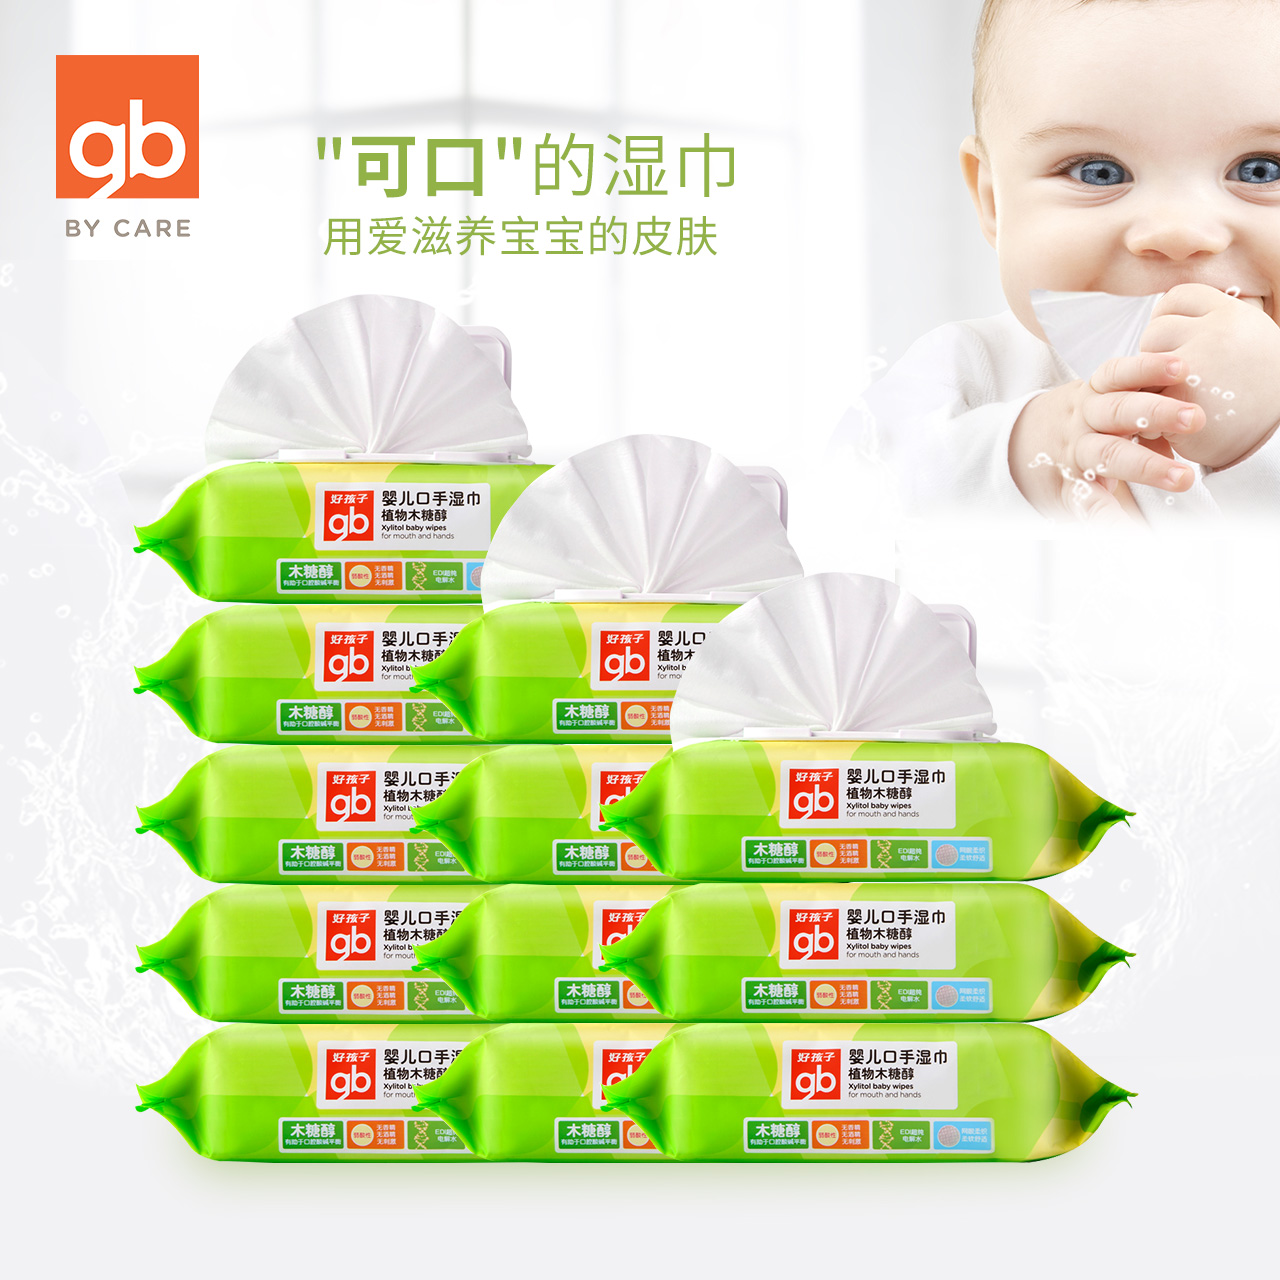 gb好孩子婴儿湿巾新生儿宝宝手口屁屁专用木糖醇湿纸巾80抽12包